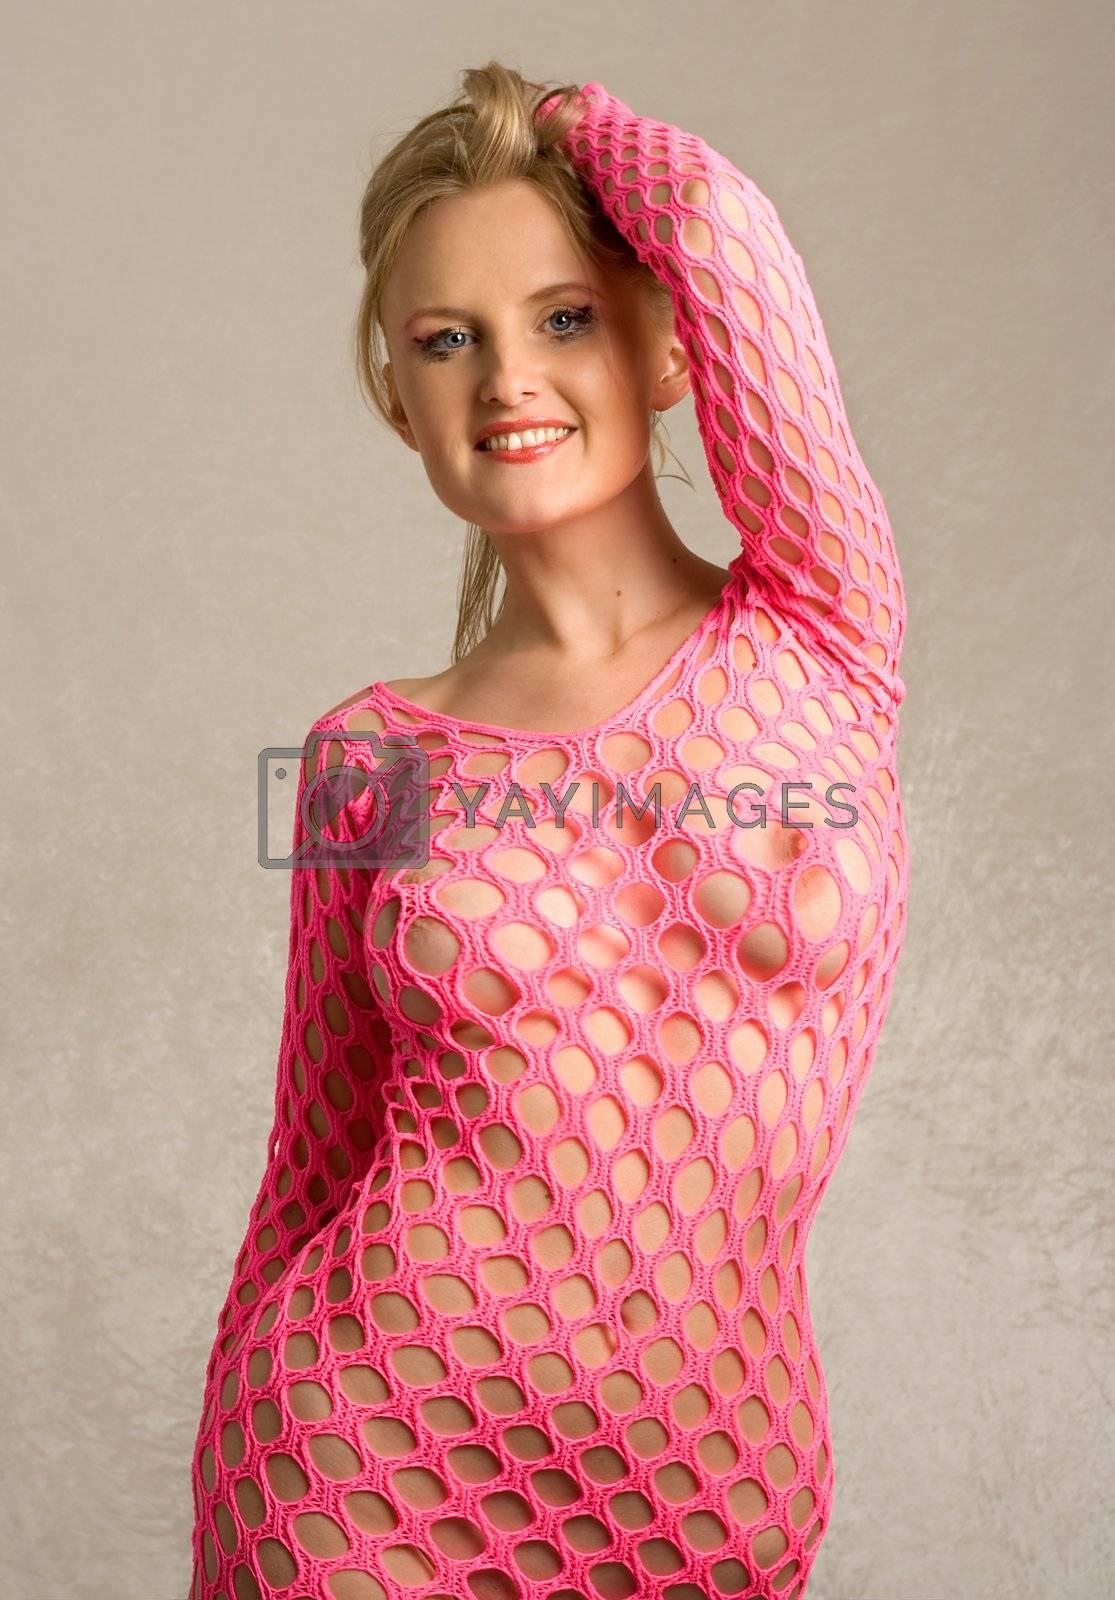 pretty lady in rose fishnet dress